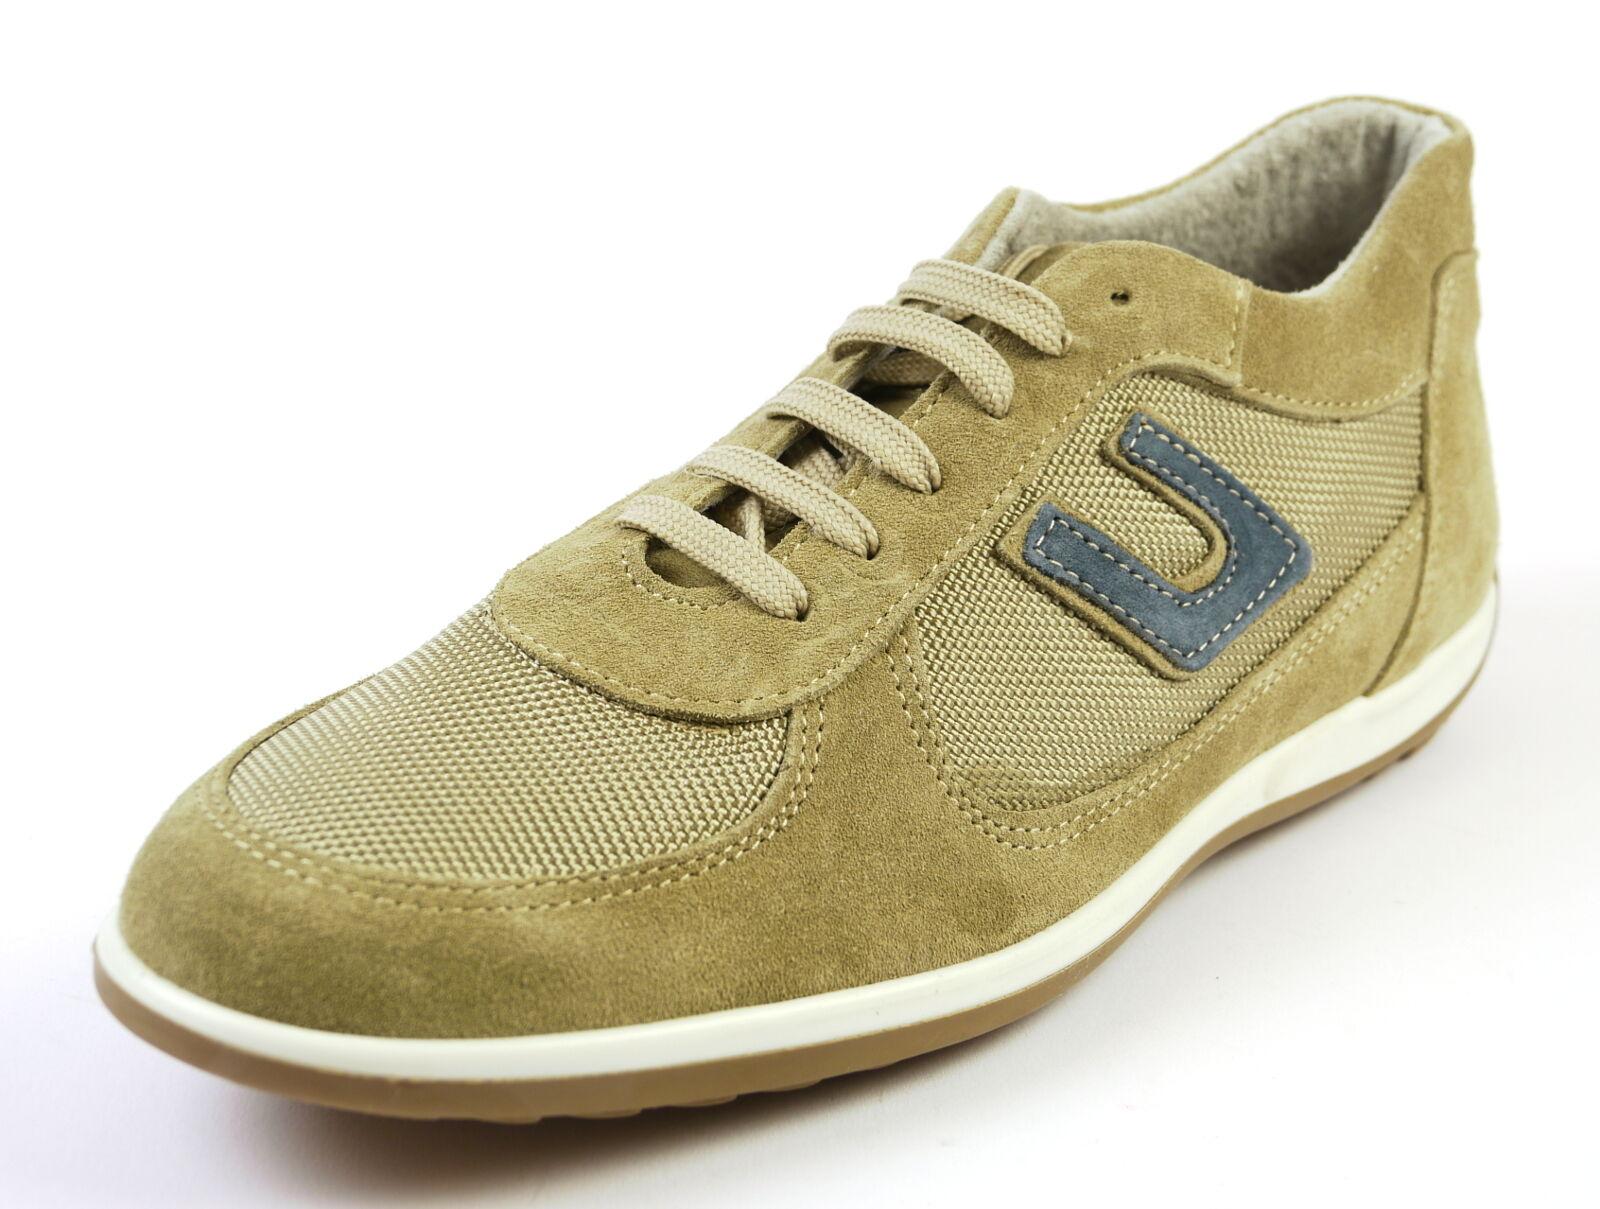 Camosico 306 italienischer stylischer italienischer 306 Sneaker Leder Textil beige Gr. 41 -43 NEU 2d803b